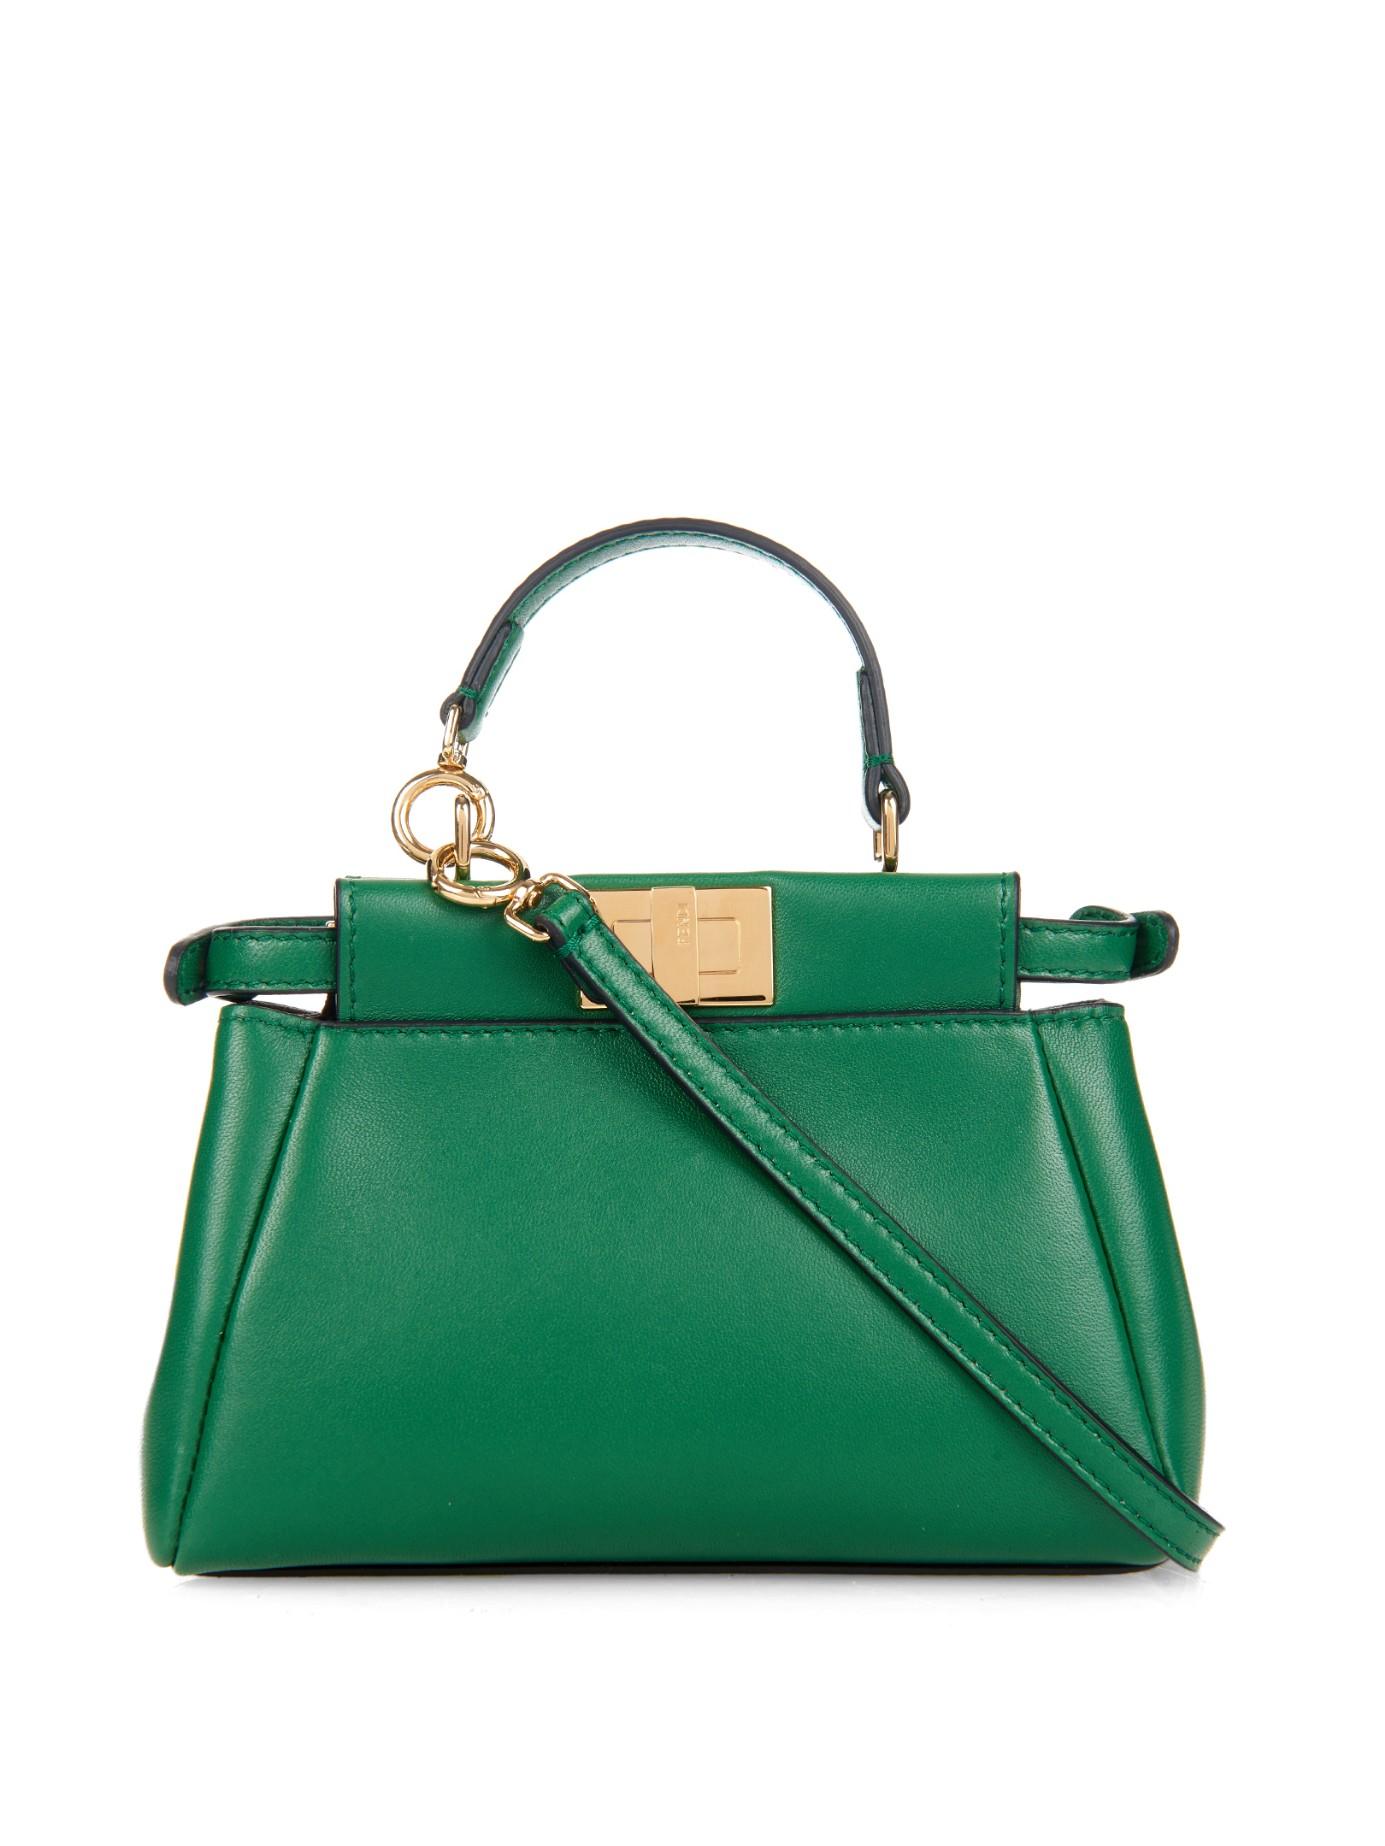 c227a86bb5 Fendi Micro Peekaboo Cross-Body Bag in Green - Lyst